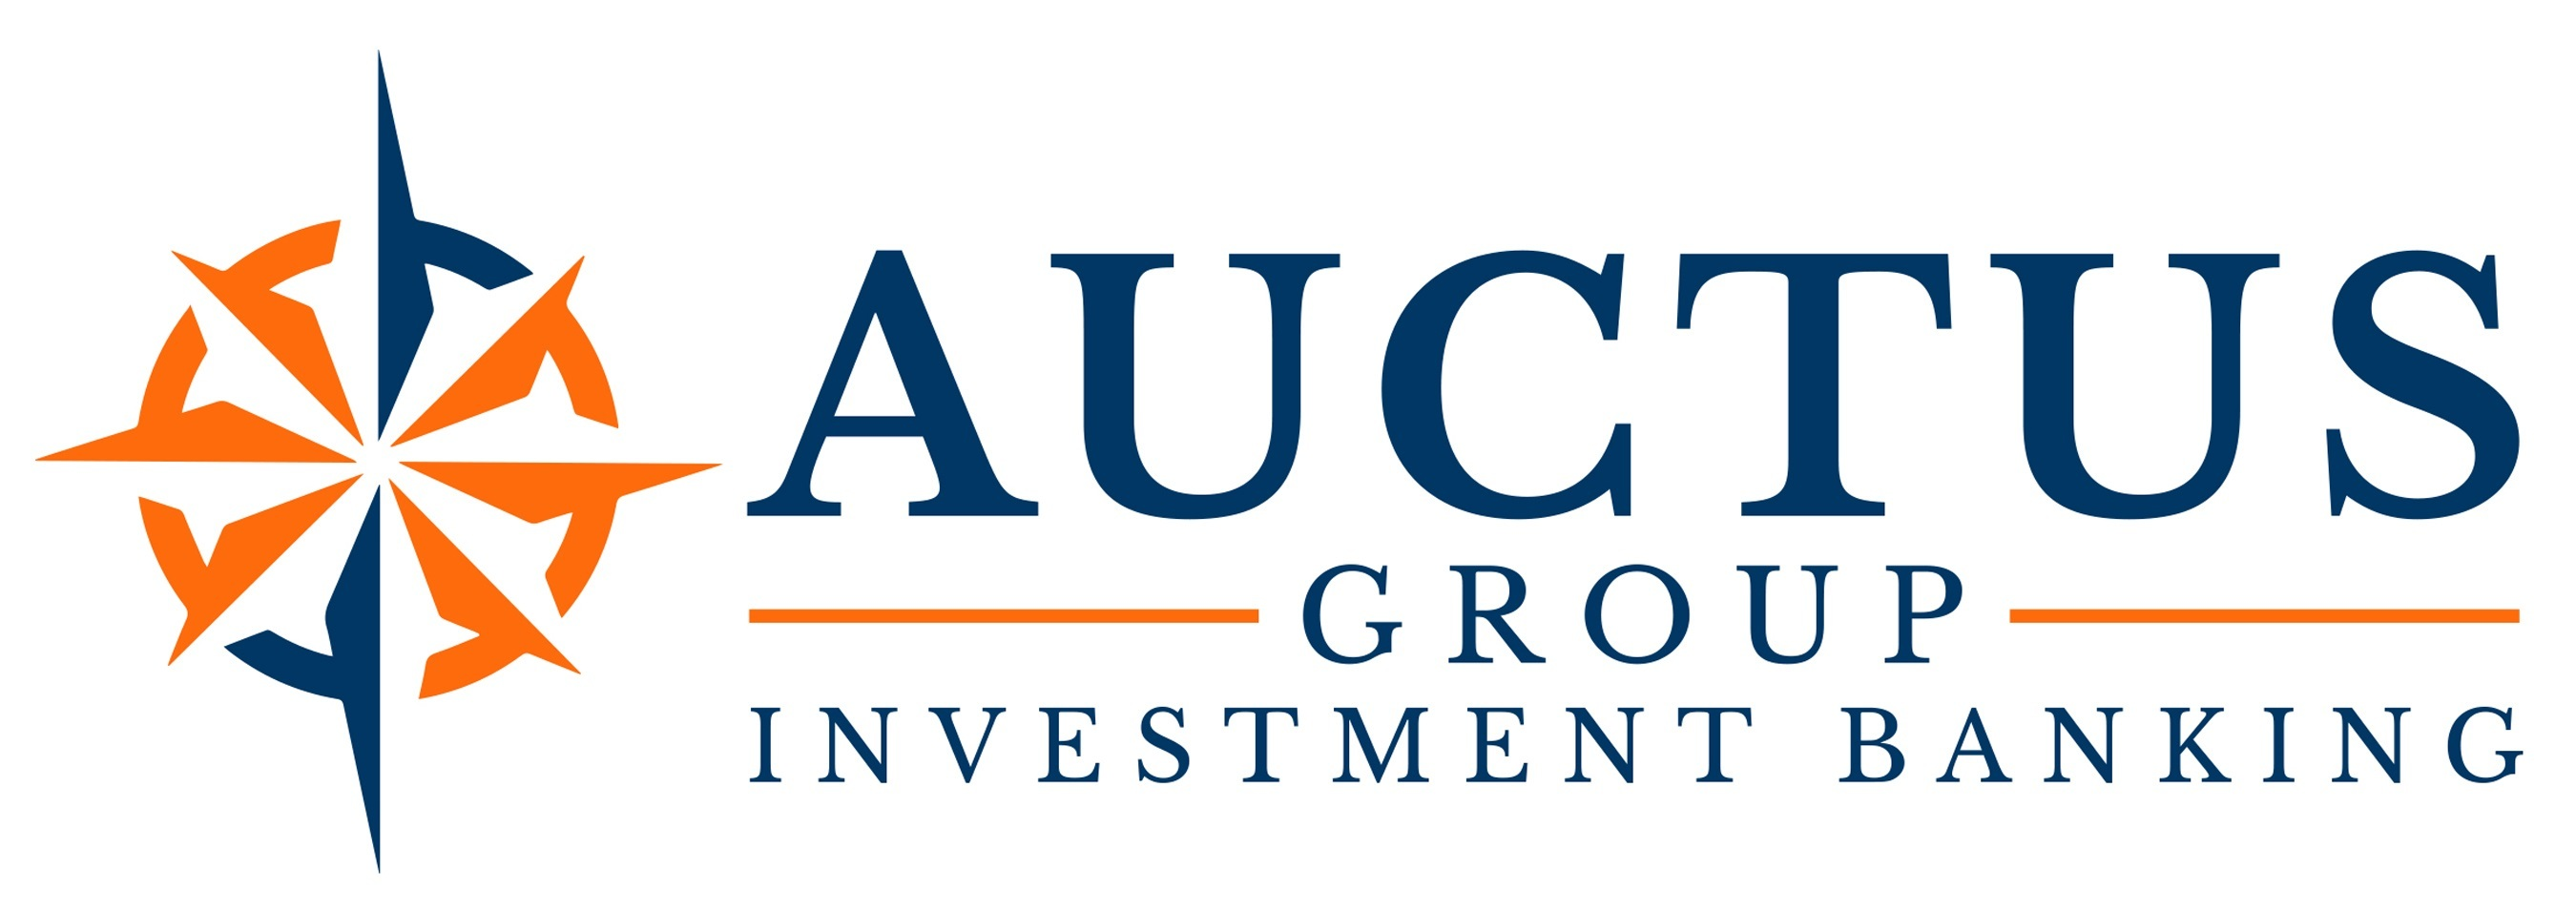 Auctus Group Inc. Logo